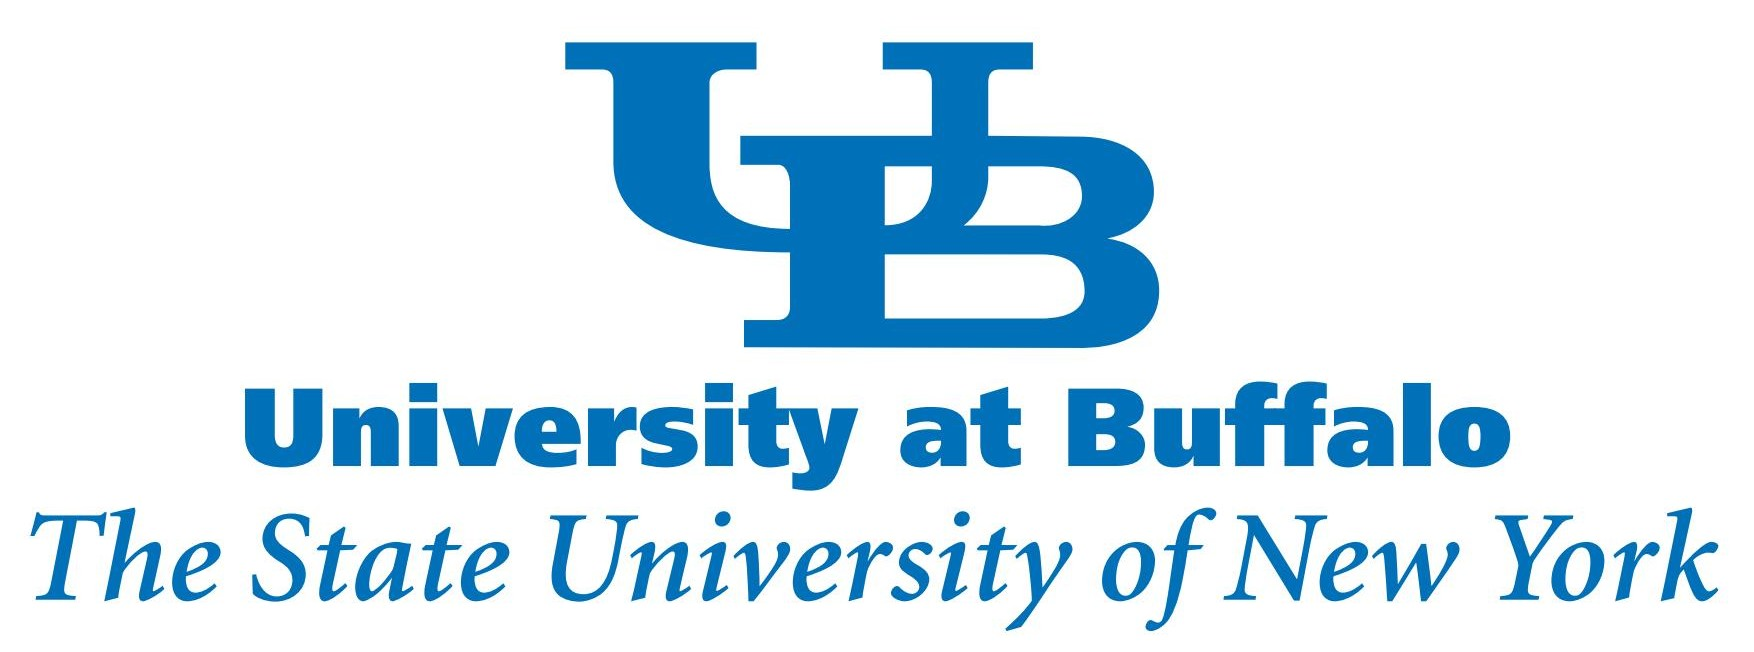 University At Buffalo    Dr. Joseph Atkinson,  Environmental Engineering